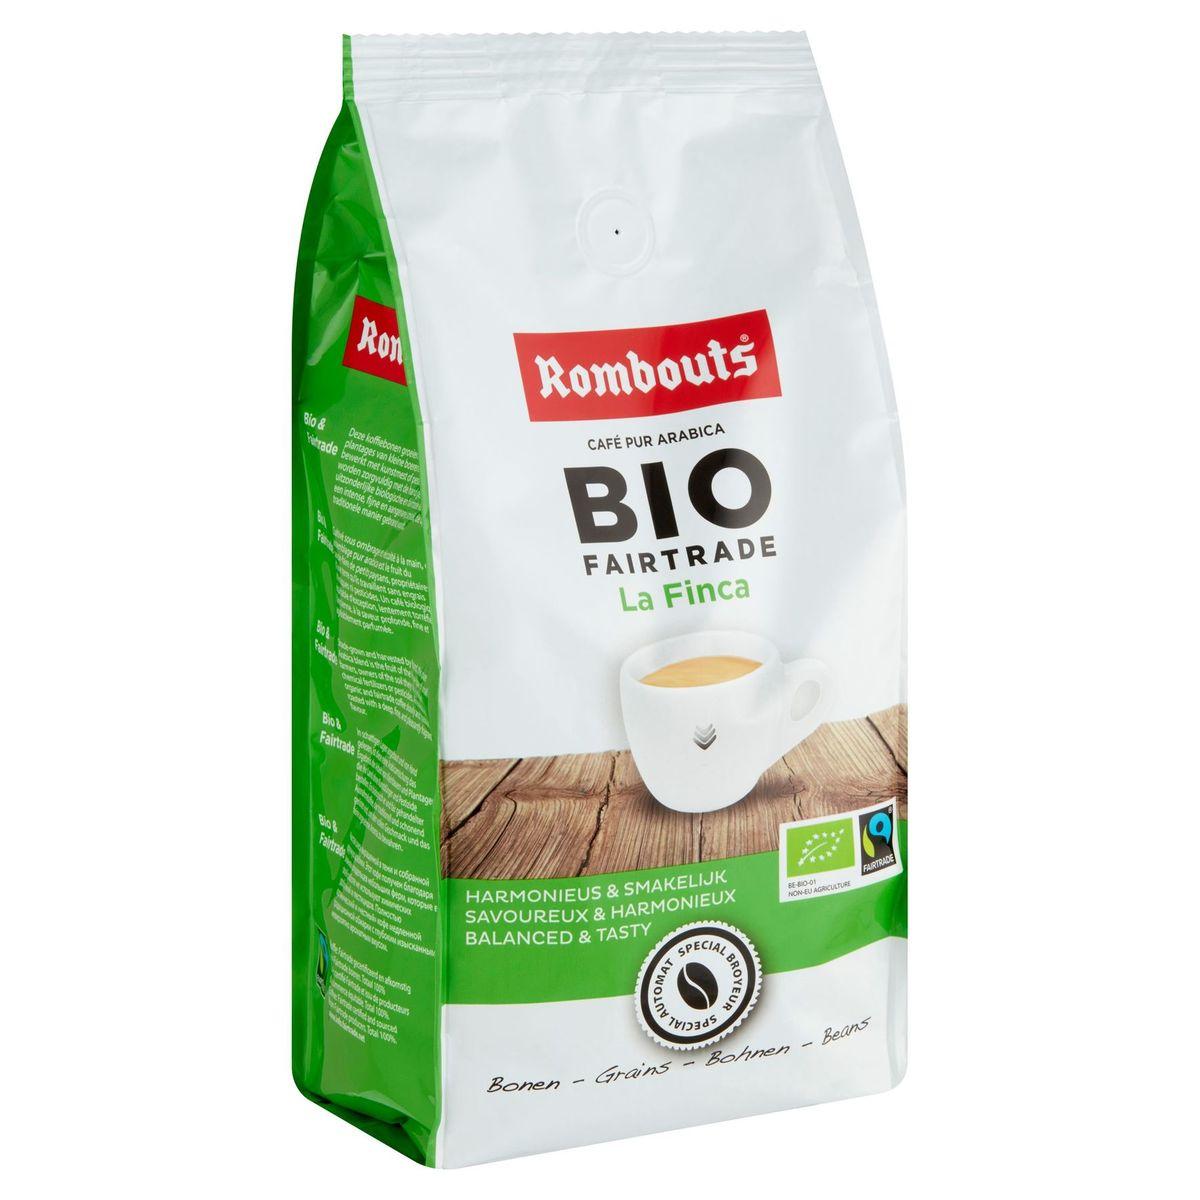 Rombouts Bio & Fairtrade Grains 500 g